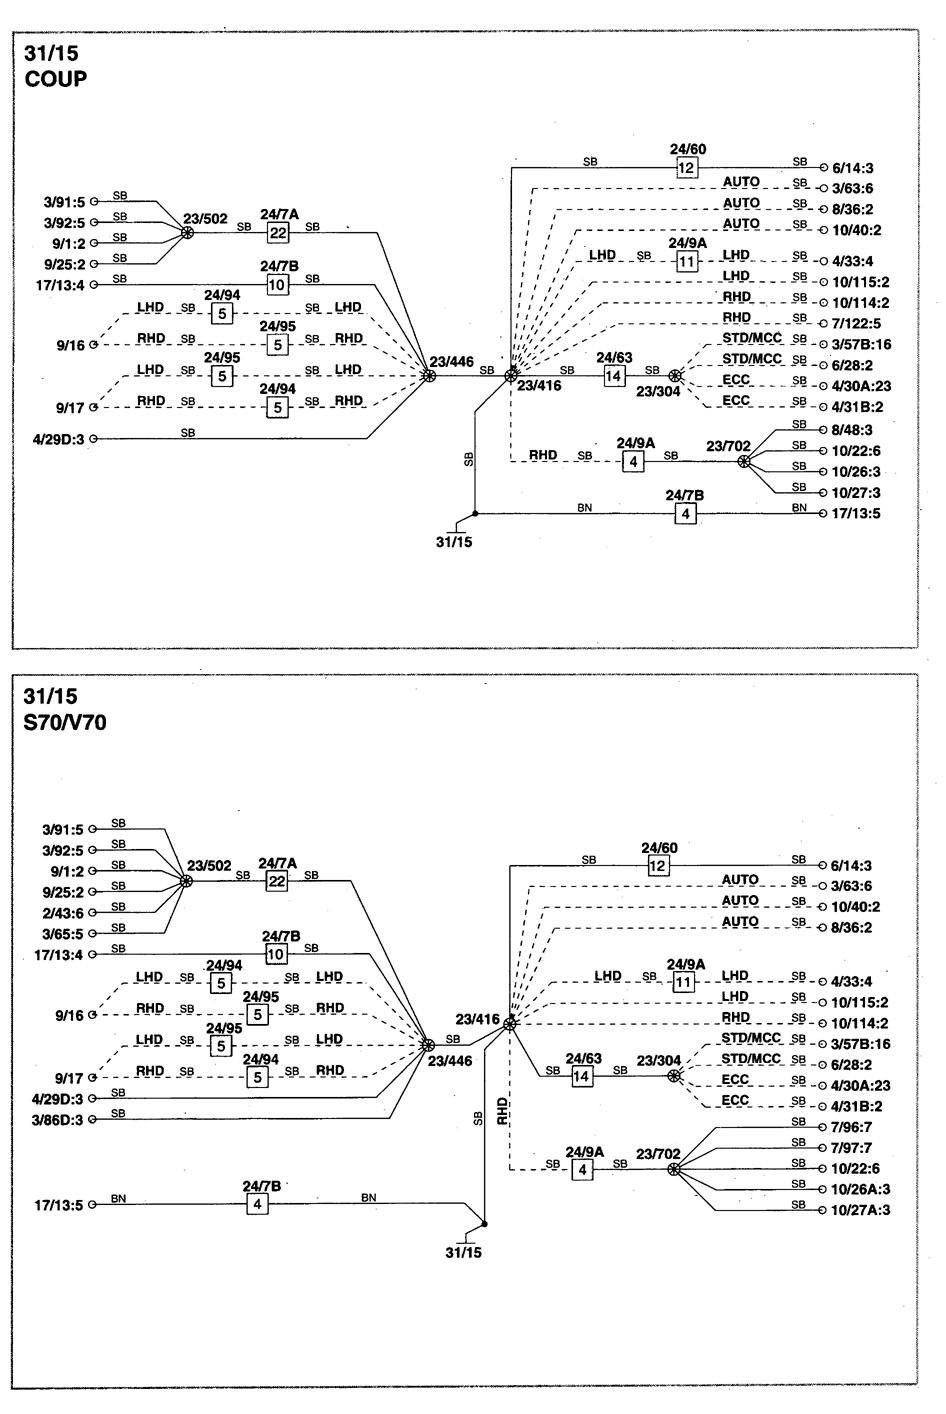 110 Volt Wiring Color Code Schematics Diagram Ddoax6pbooo Cable Dc 12 Explained Diagrams Iec Power Cord